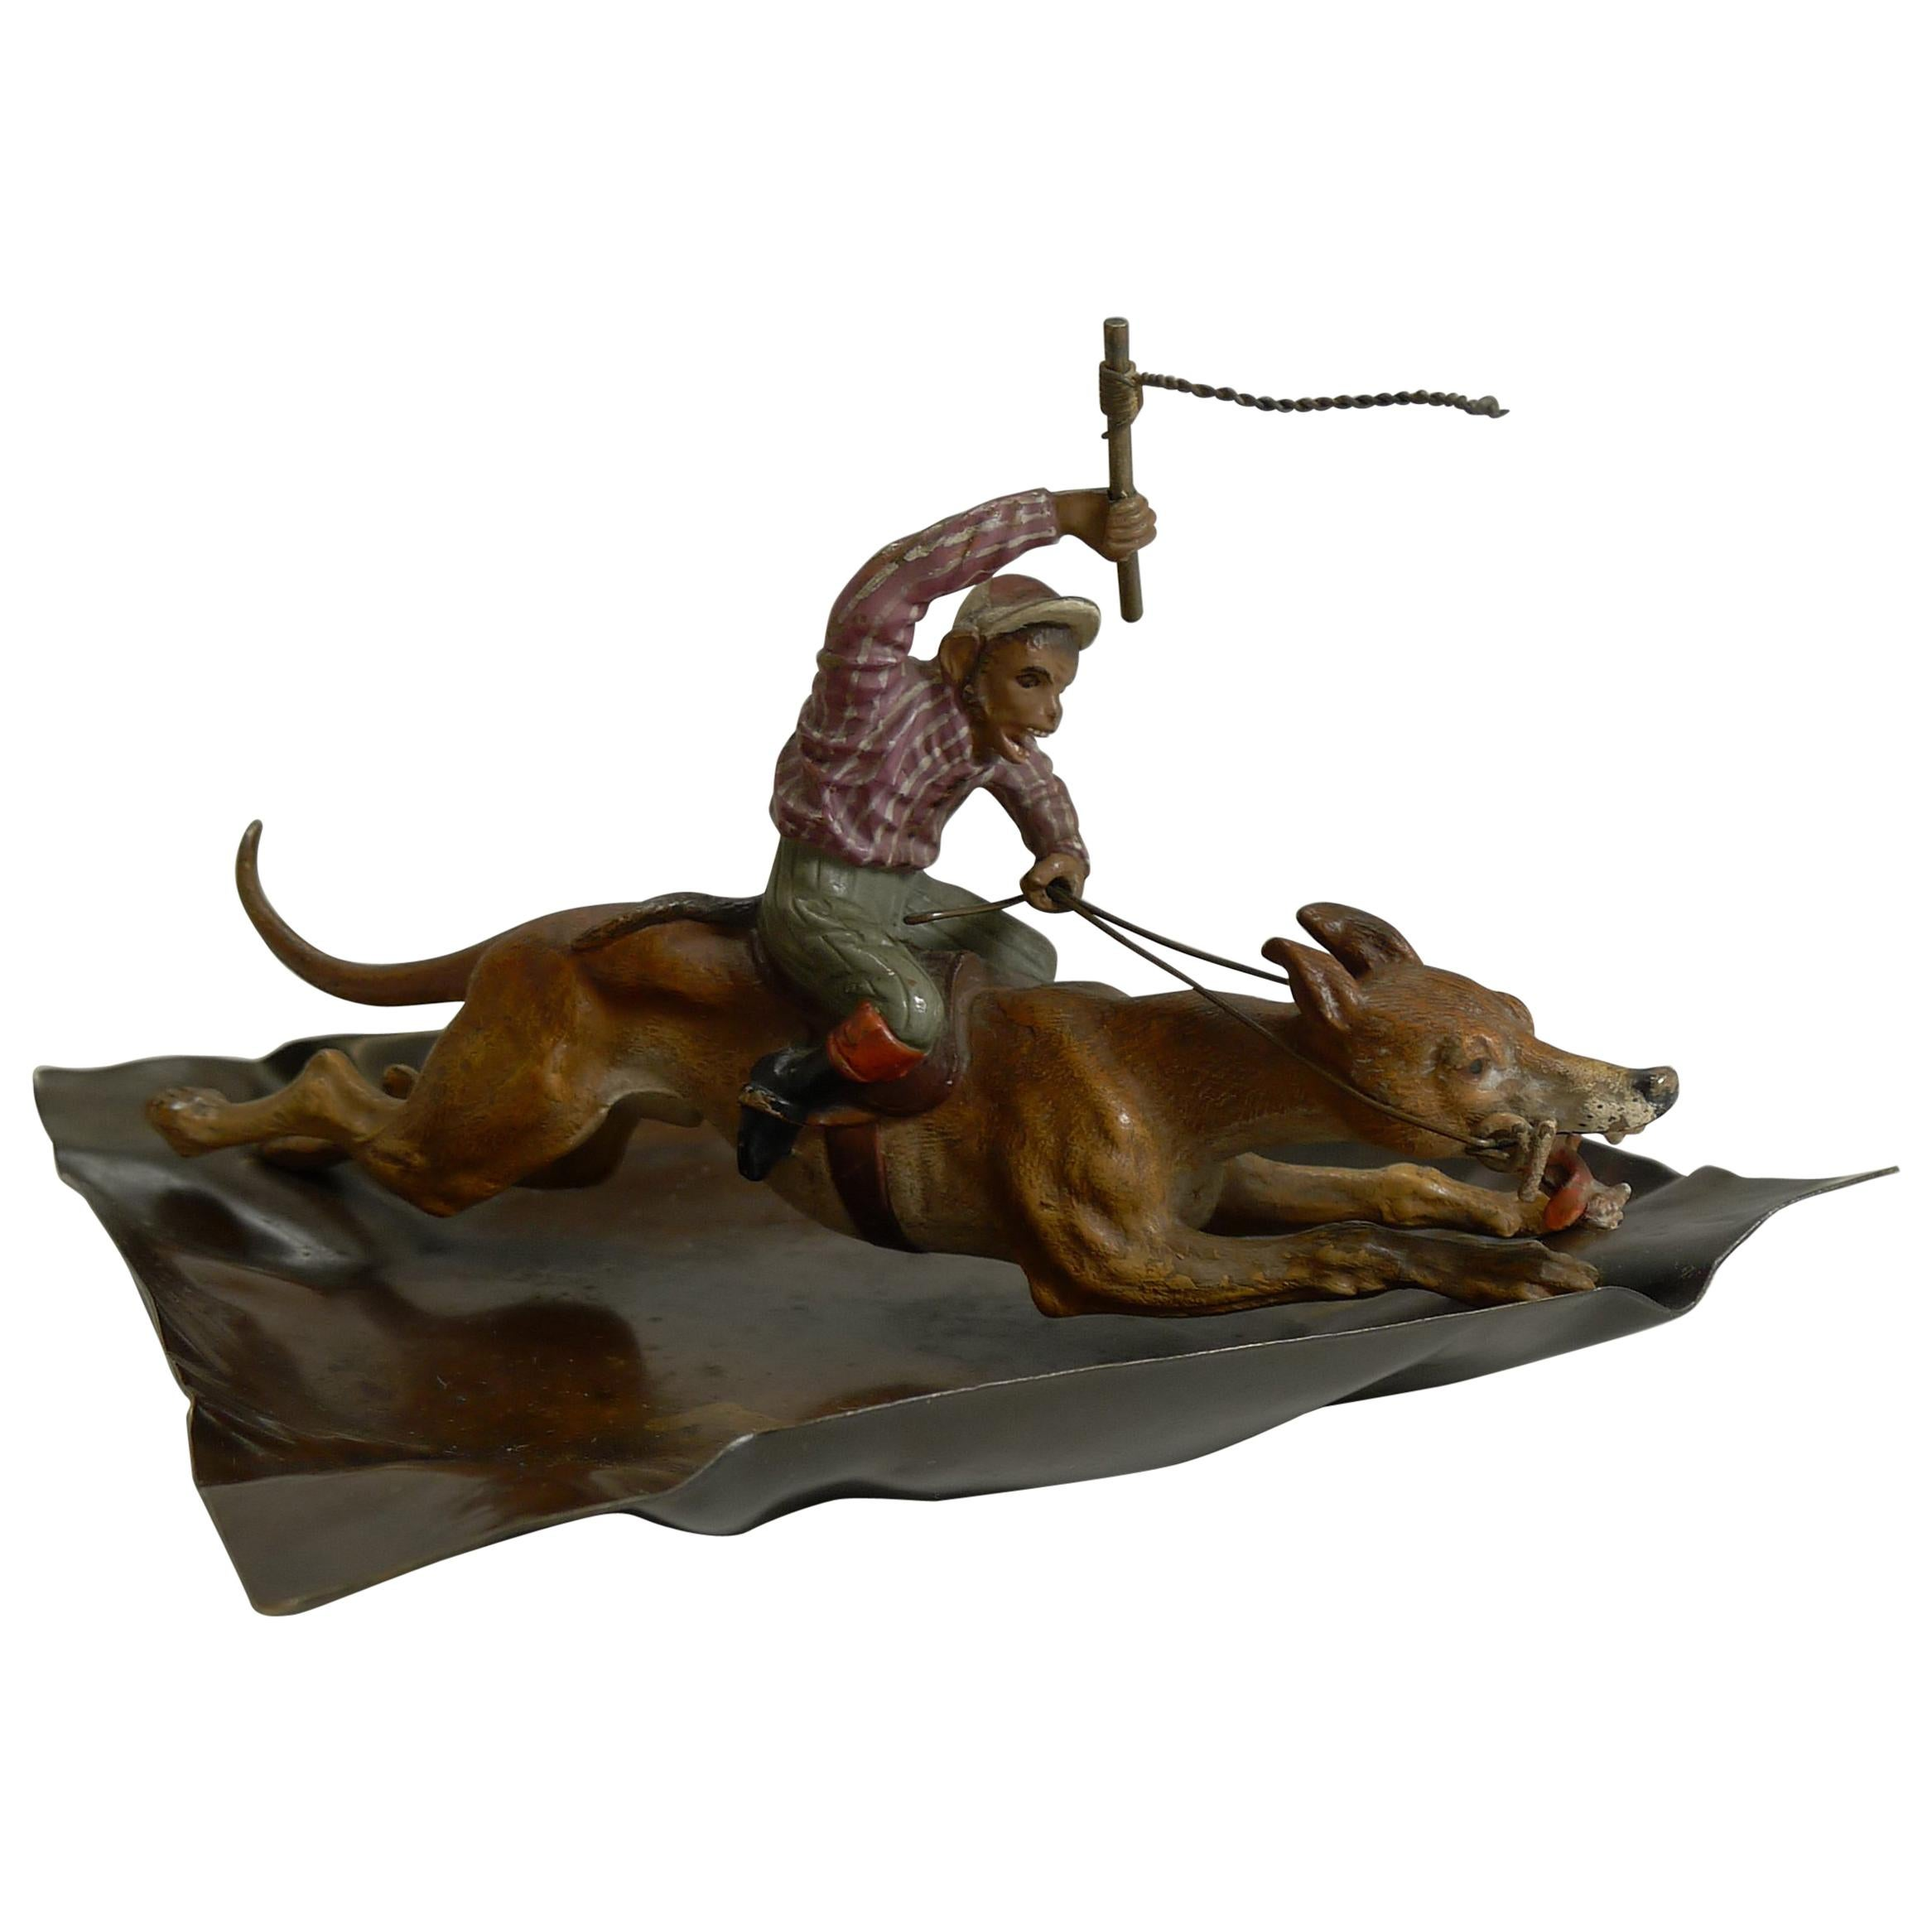 Cold Painted Vienna Bronze Dish, 'Monkey Racing a Greyhound,' circa 1900